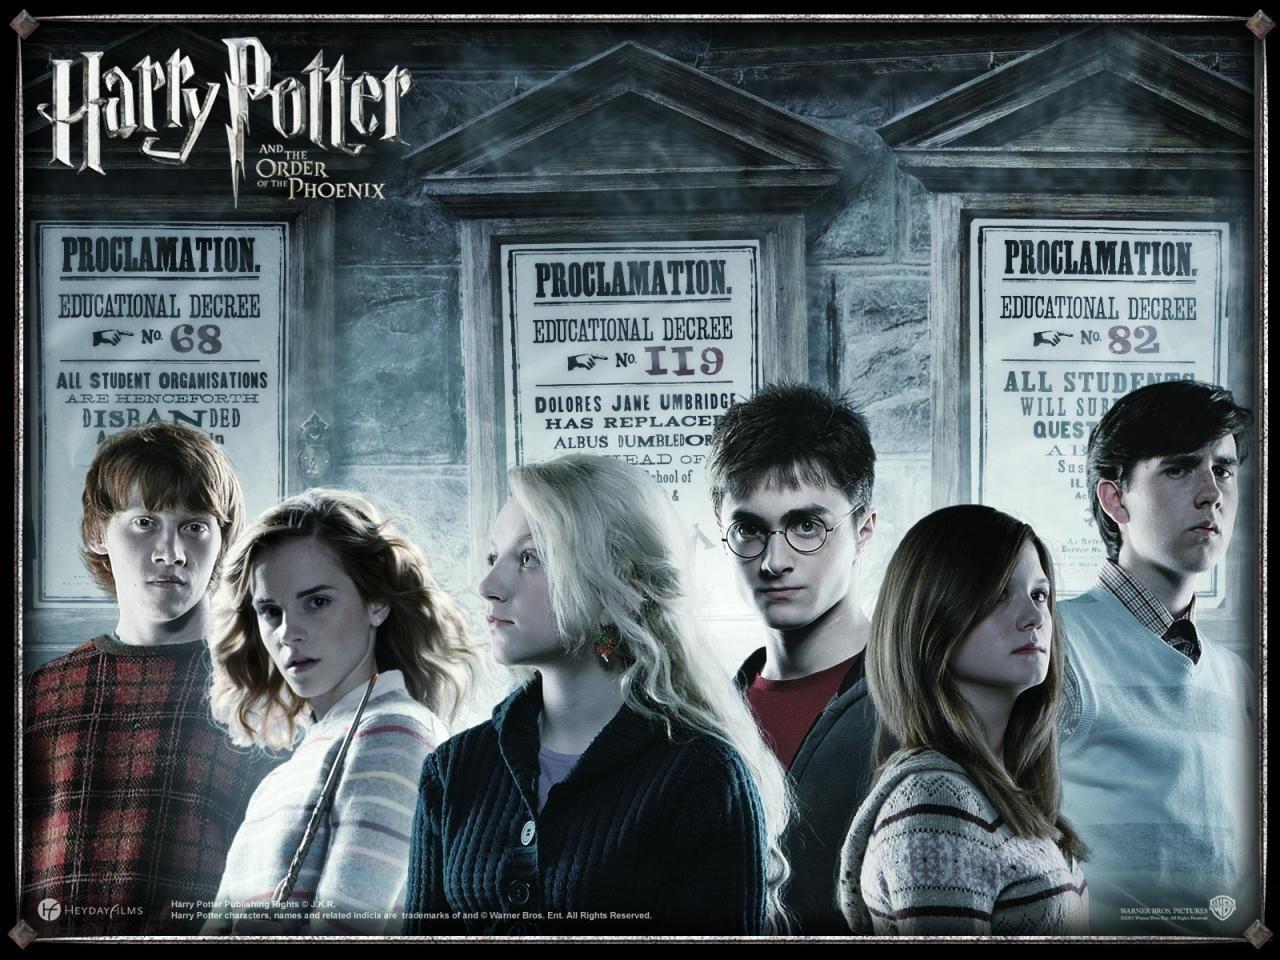 http://4.bp.blogspot.com/-Ikt3qiwAqlI/TashU6gZL4I/AAAAAAAAAXg/HRbfmkmmZv8/s1600/Harry_Potter_5_003_1280x960.jpg